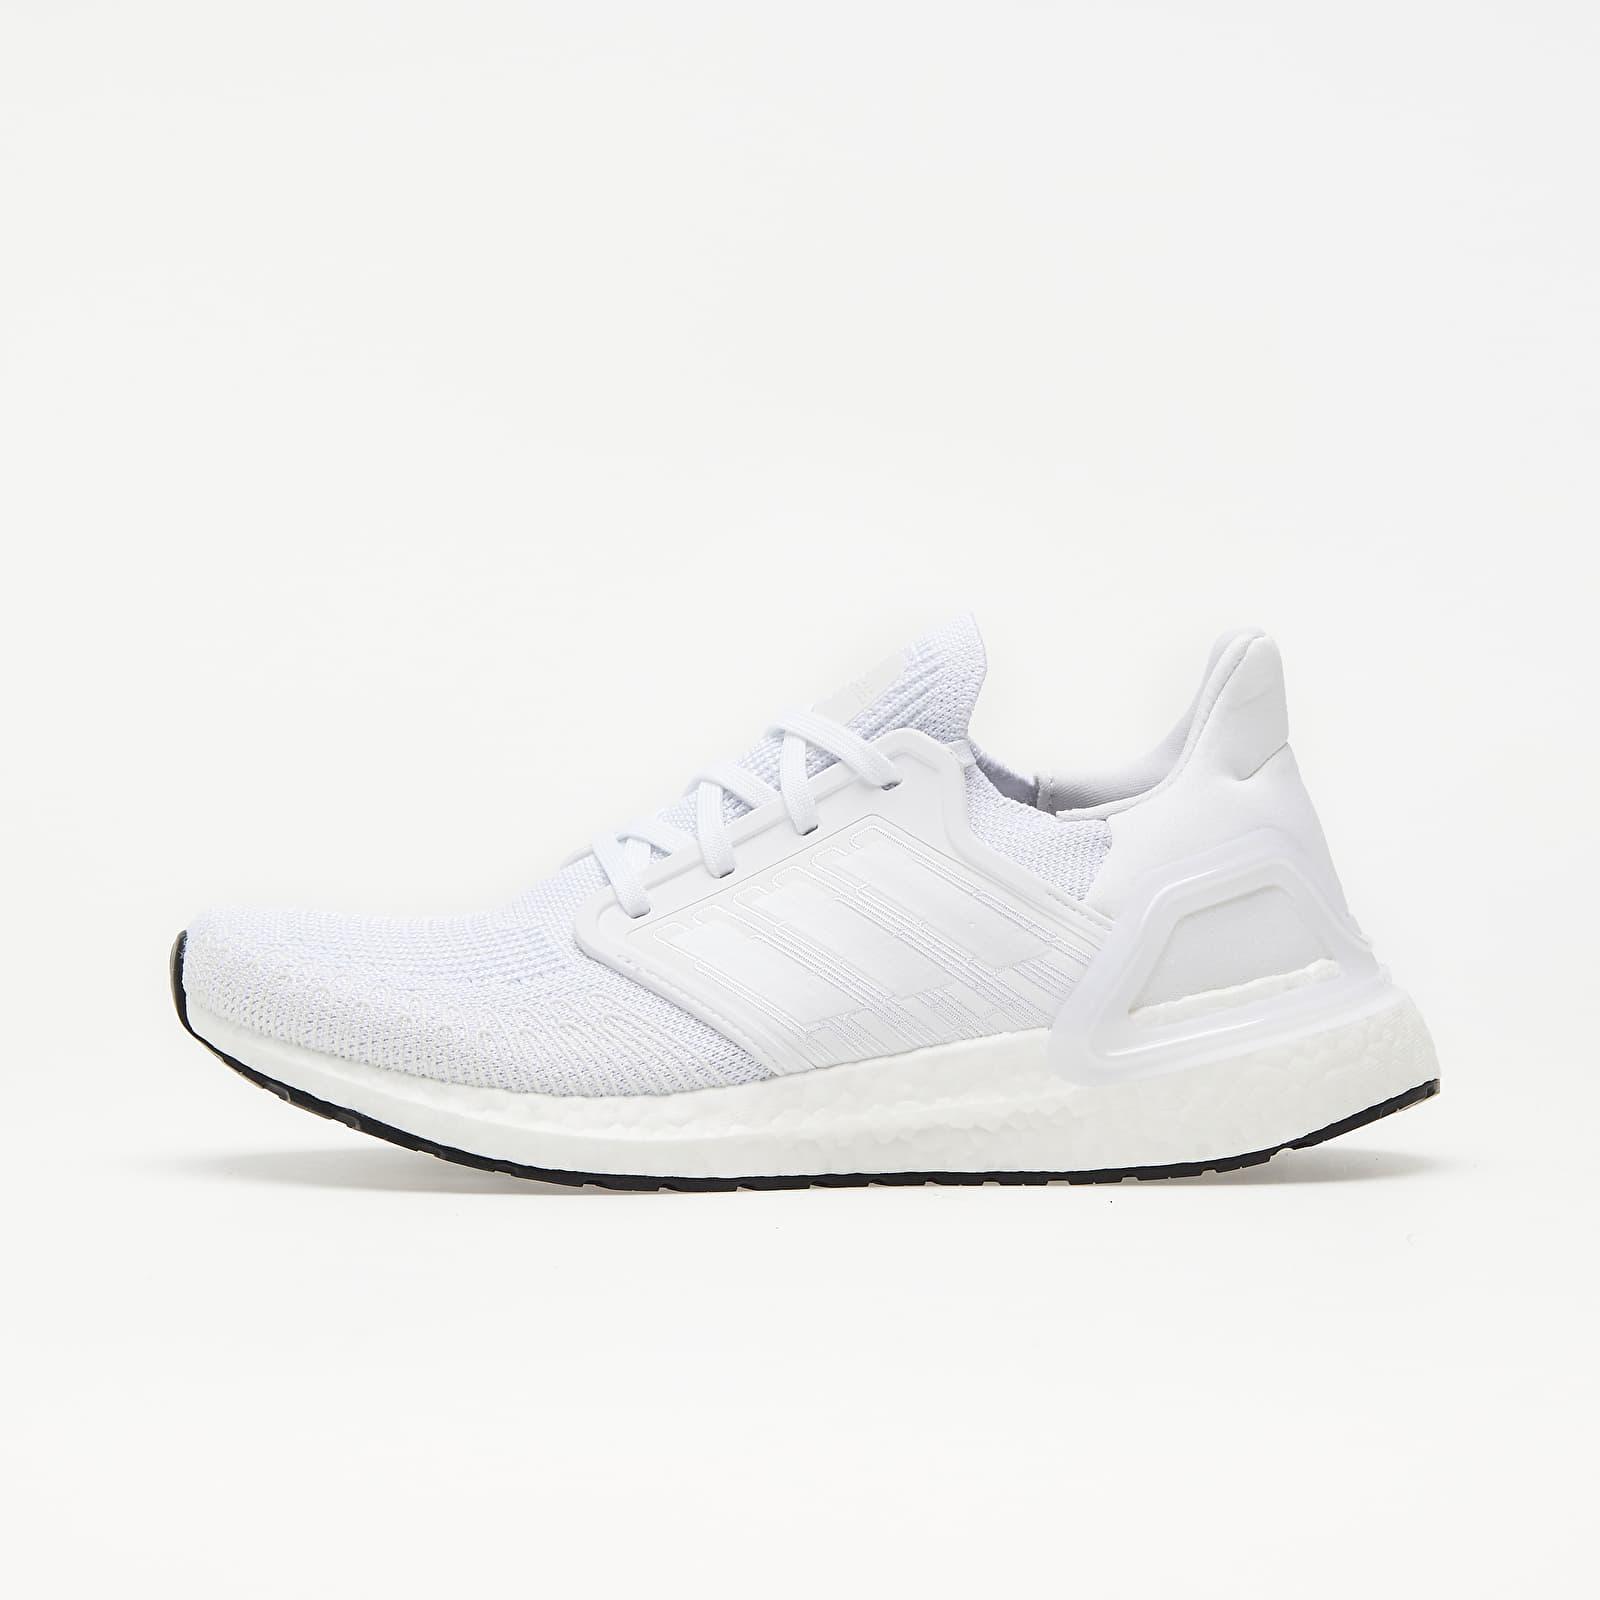 adidas UltraBOOST 20 Ftw White/ Ftw White/ Core Black EUR 43 1/3